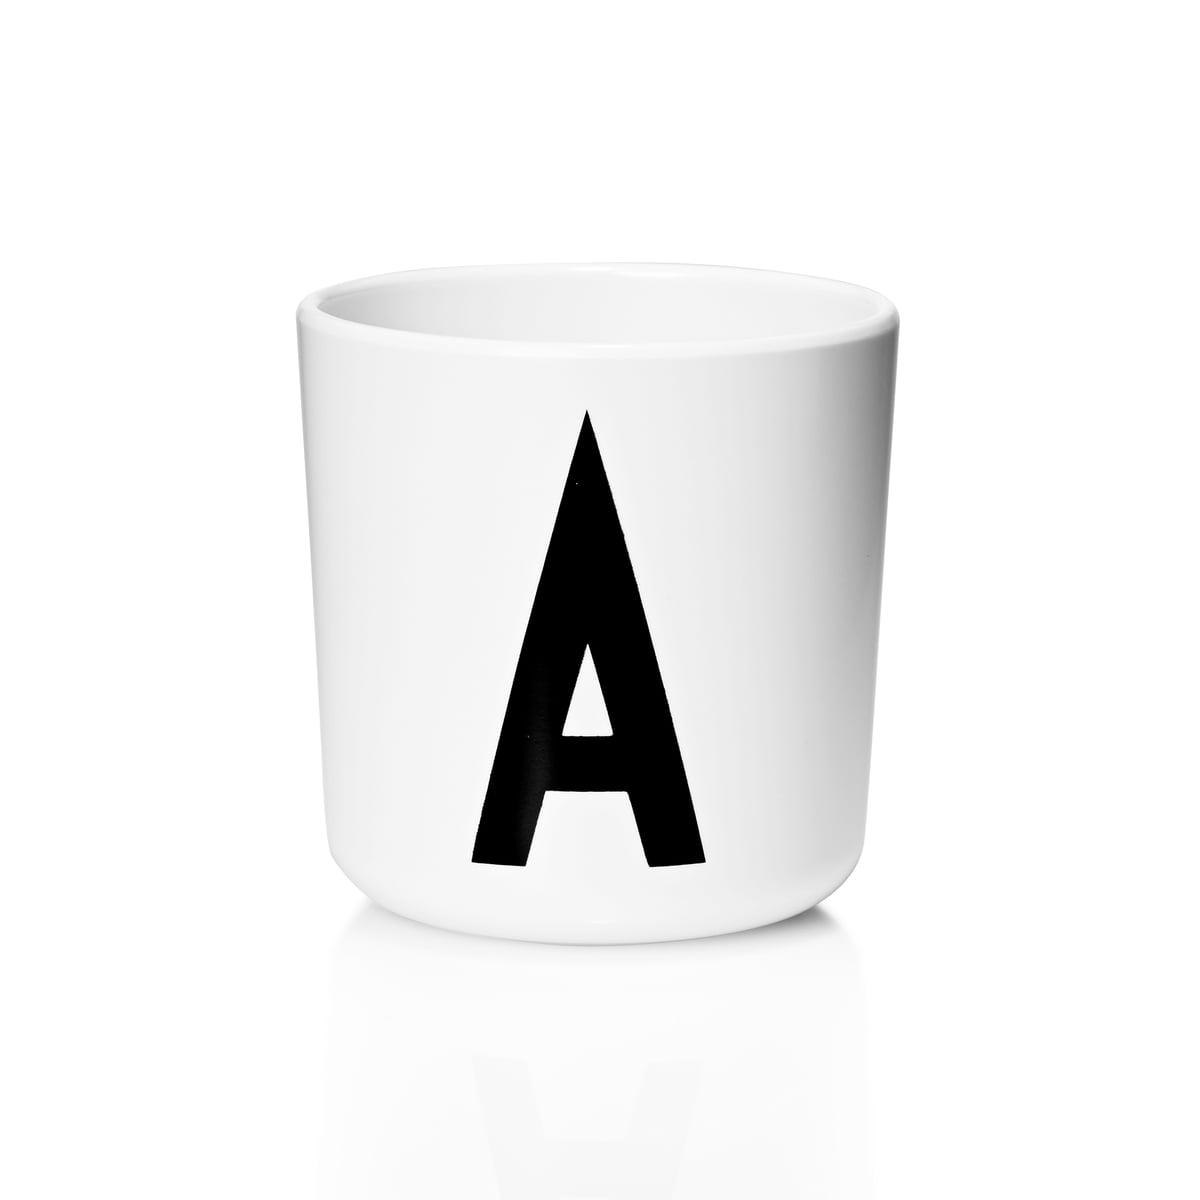 ABC Trinkbecher Buchstaben Arne Jacobsen Design Letters Melamin Becher